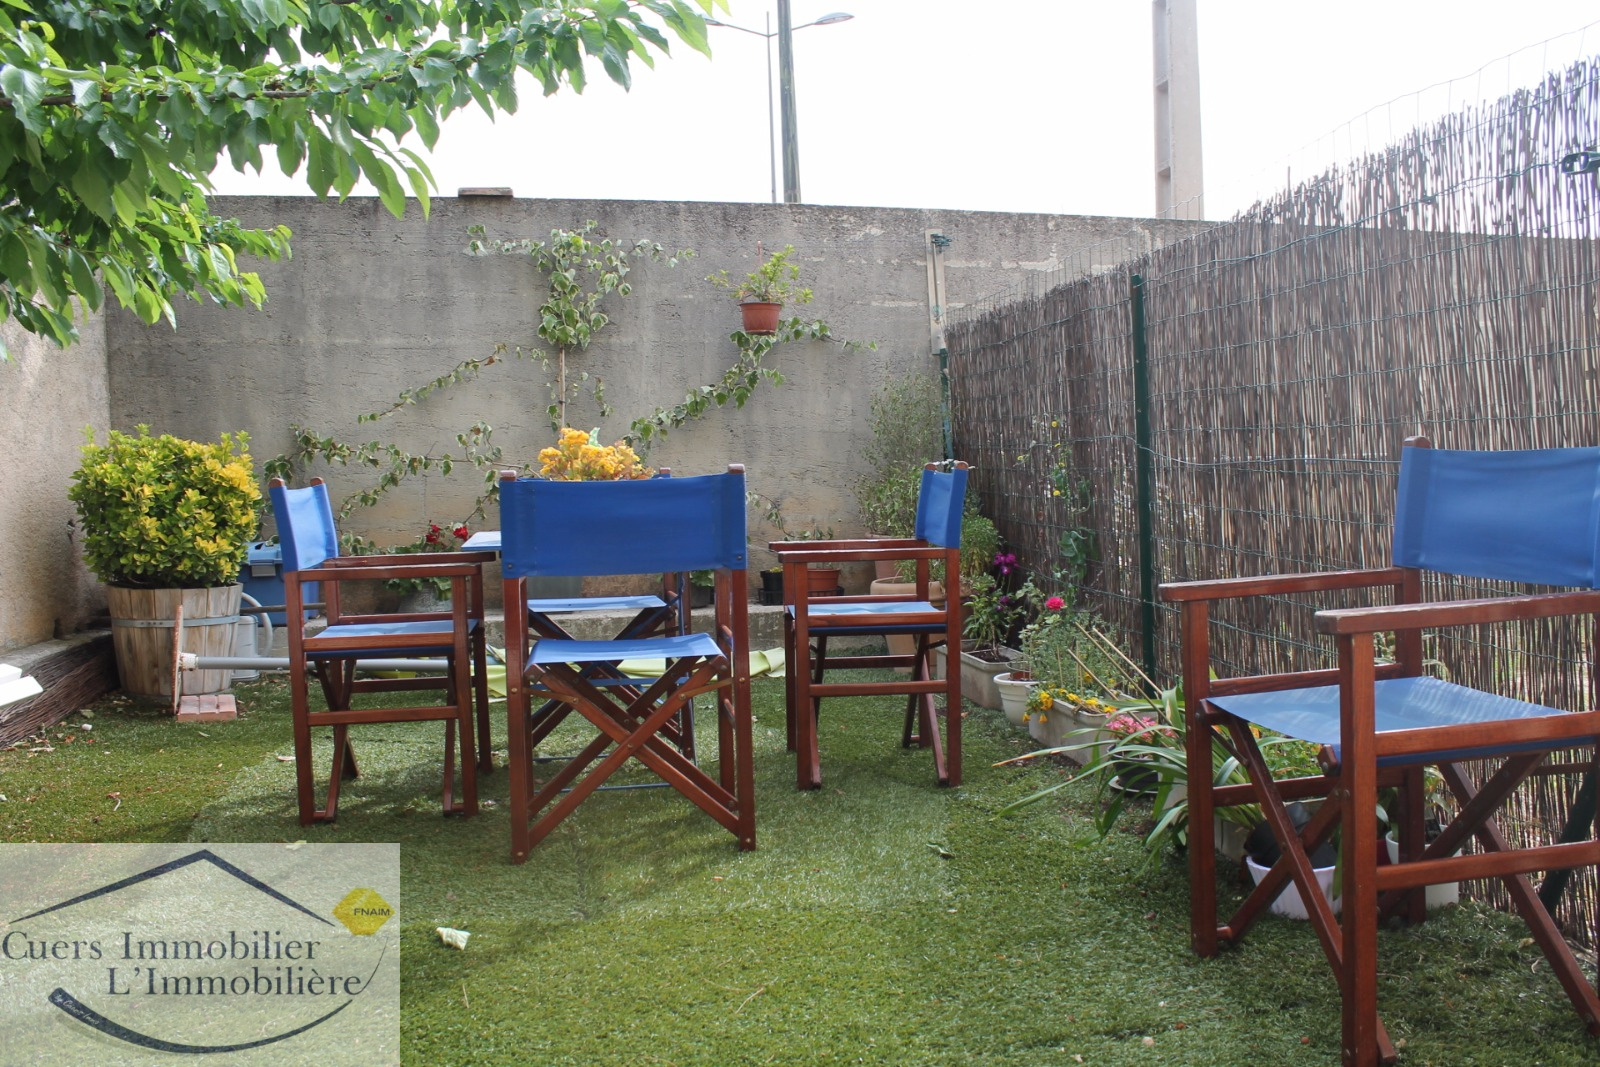 Location cuers t2 rez de jardin for Rez de jardin